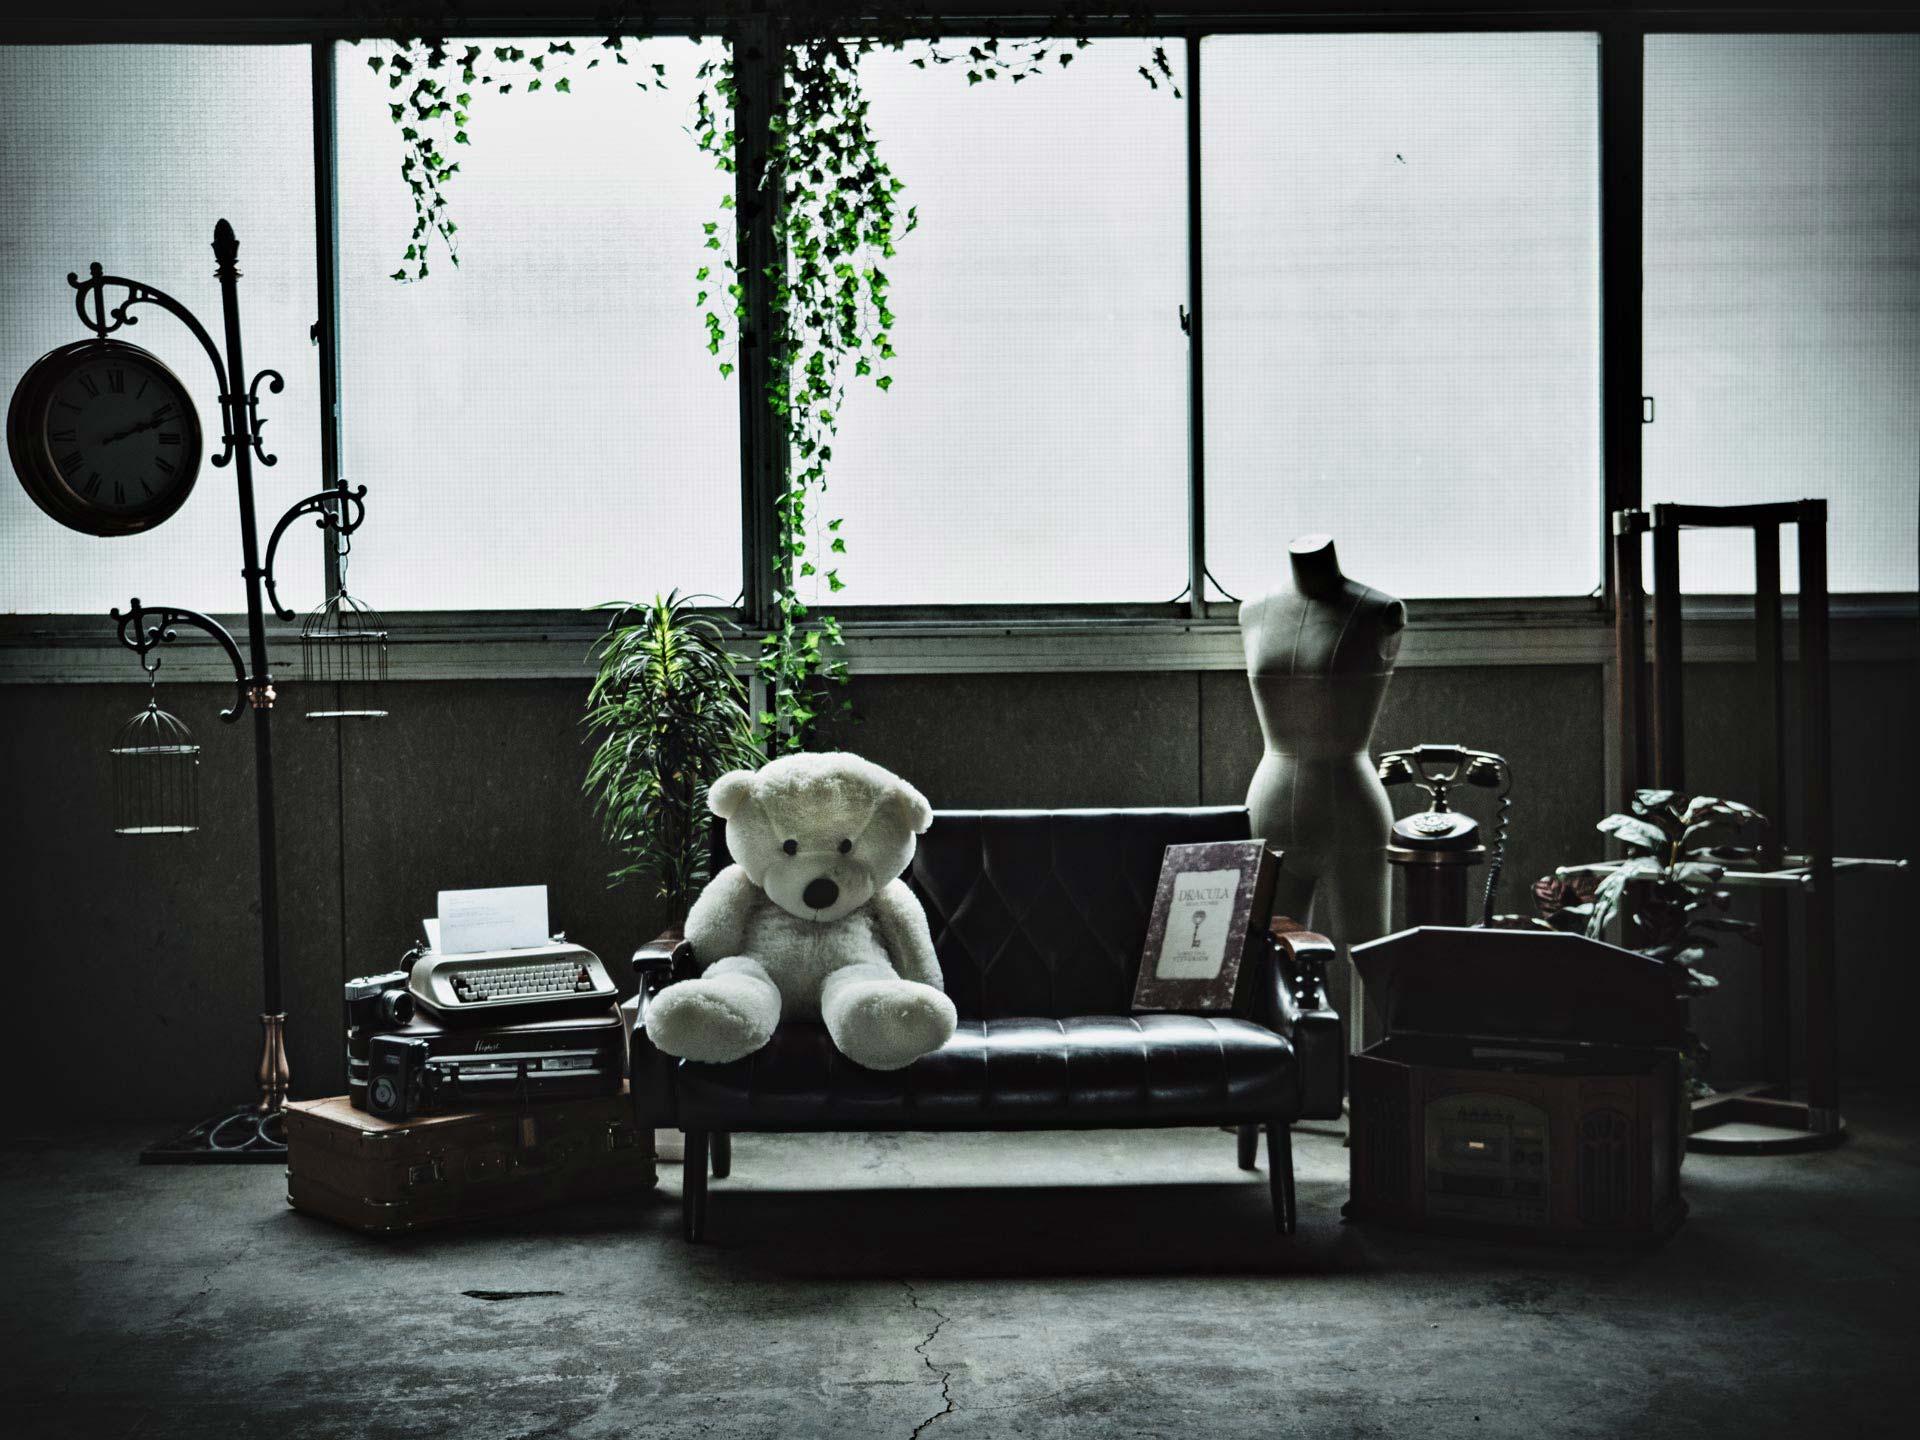 【Aフロア】 コンクリートブロックでグランジの世界観 - 撮影スタジオ【とらんばねーろ】 撮影スペースの室内の写真